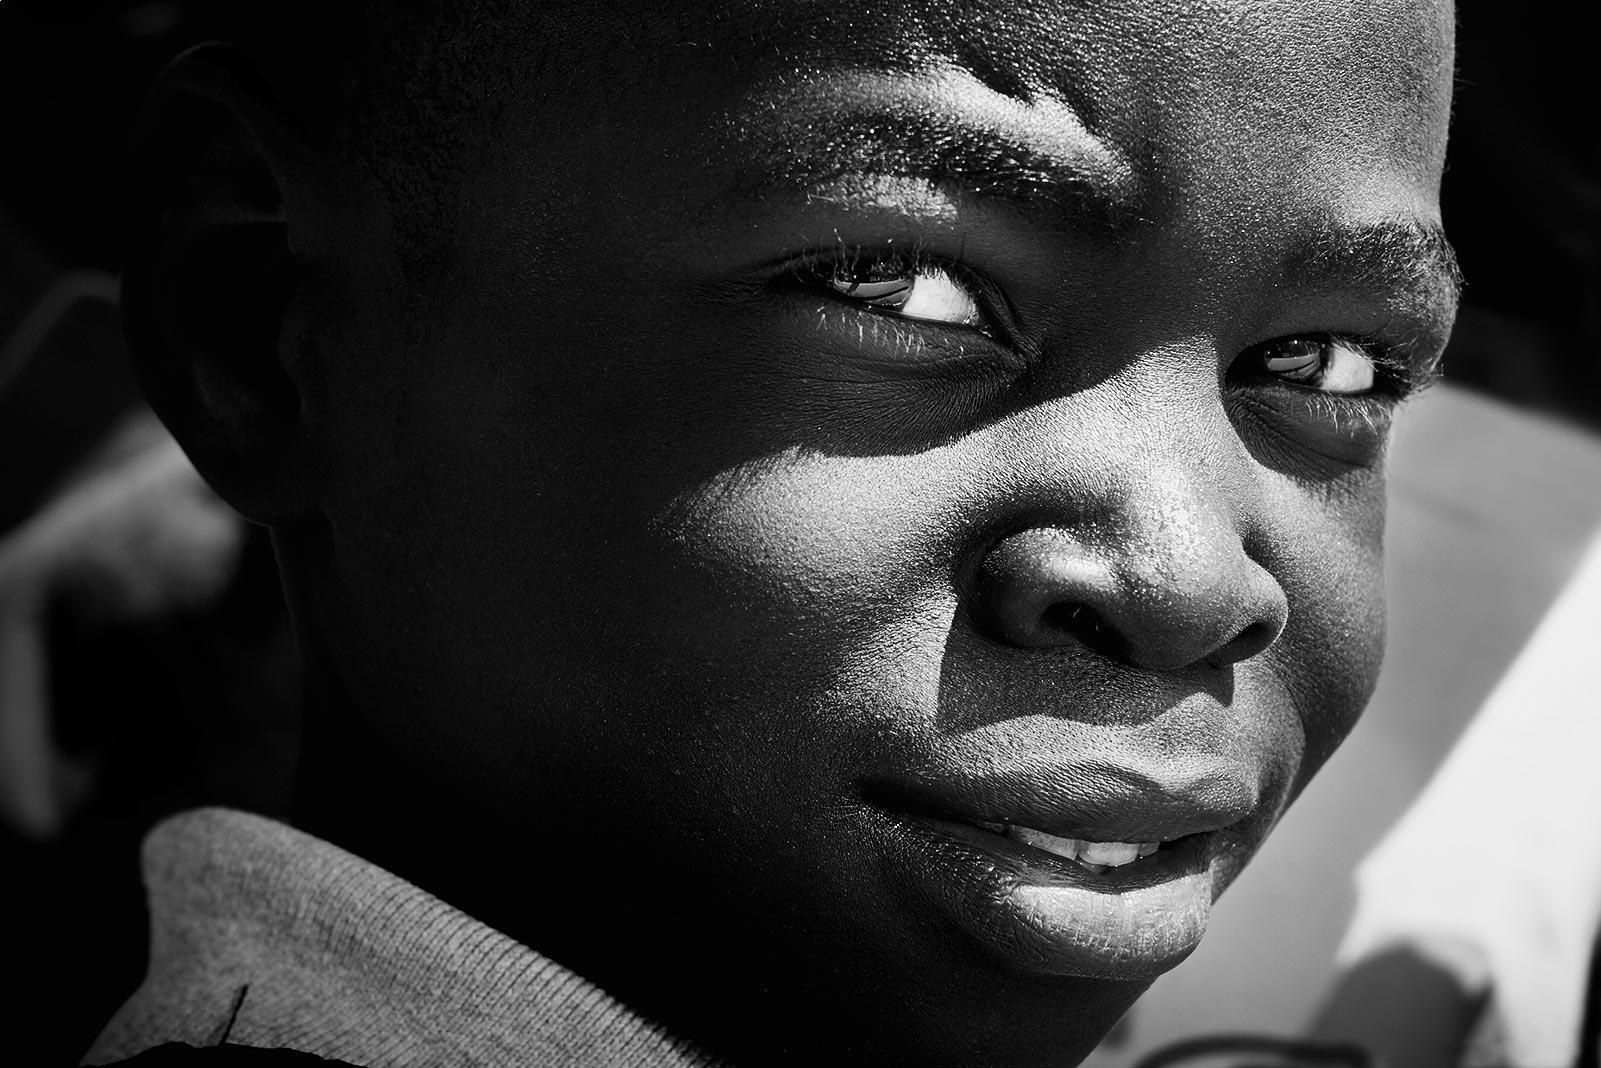 ragazzo-zambiano5